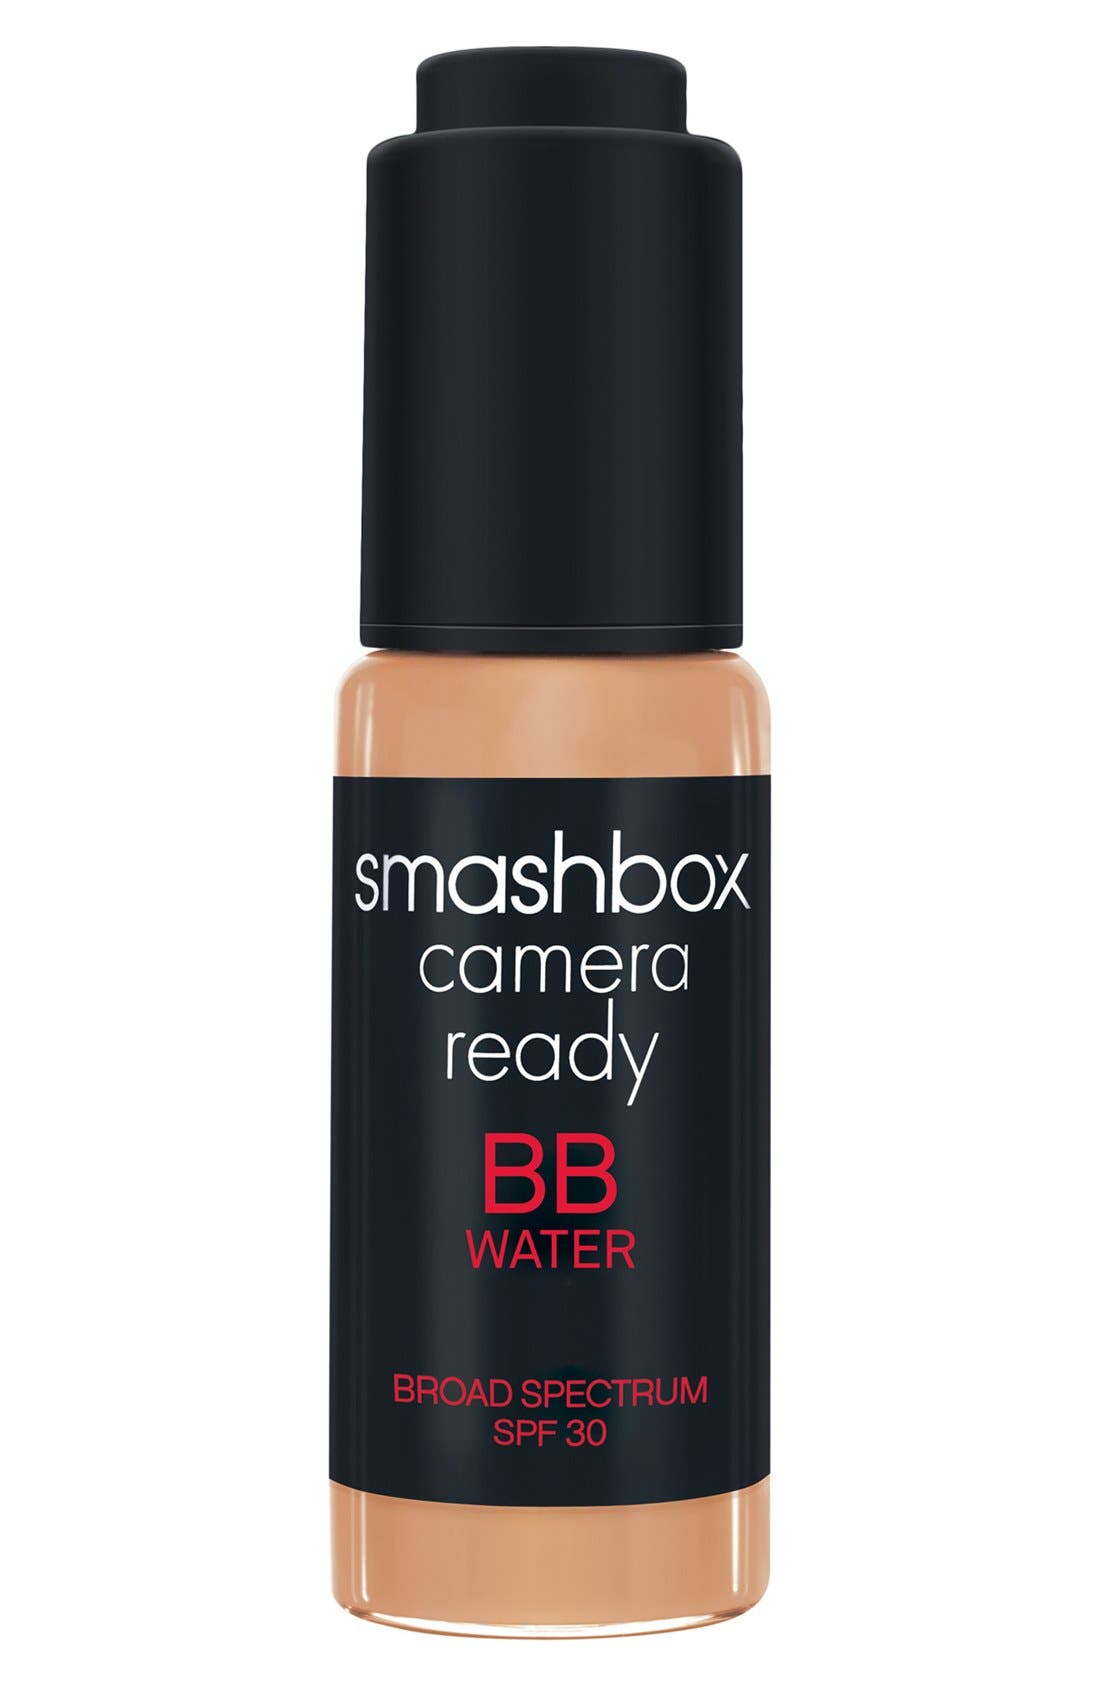 Smashbox Camera Ready BB Water Broad Spectrum SPF 30